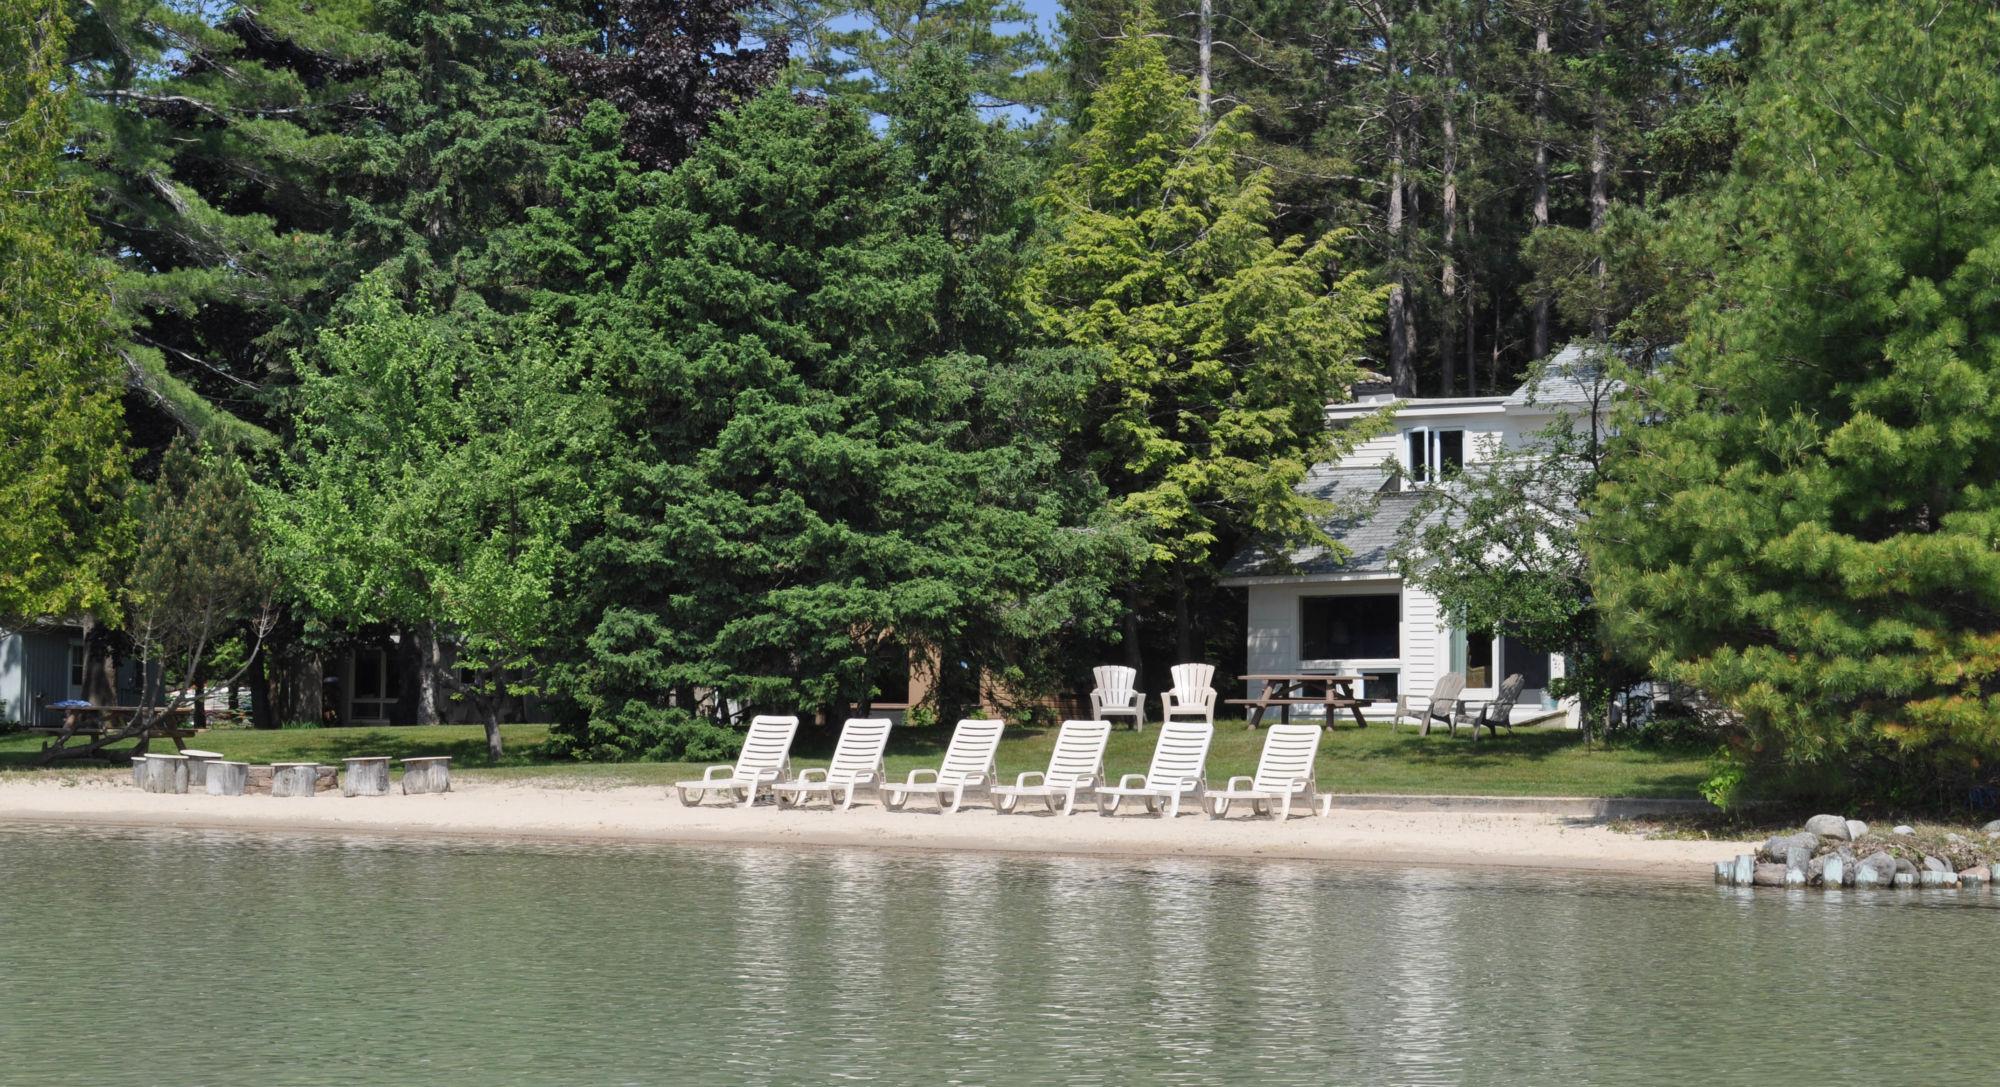 ihg hotels by rentals en inn hoteldetail holiday keweenaw cabins us express hotel htnkw houghton cabin holidayinnexpress lake